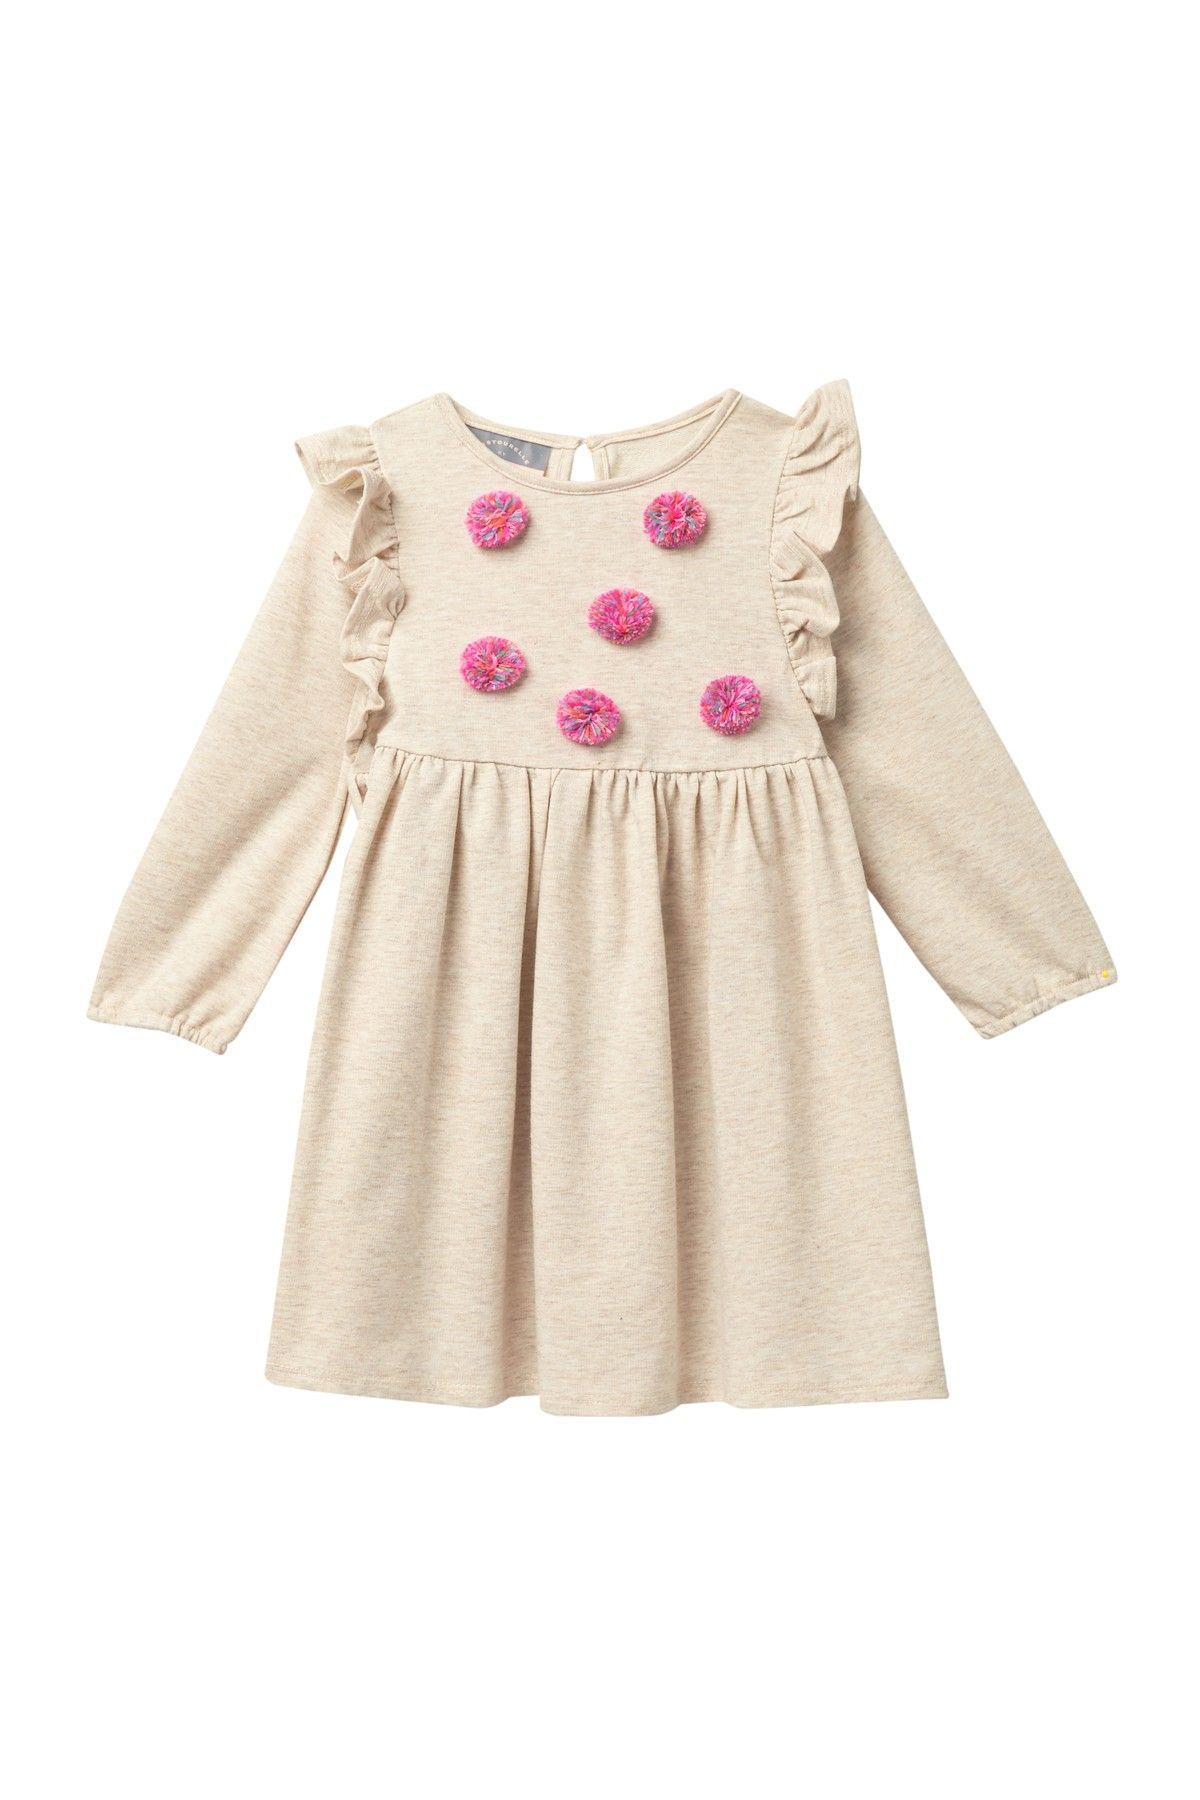 Pastourelle by Pippa and Julie | Ruffle Pompom Dress (Toddler & Little Girls #nordstromrack